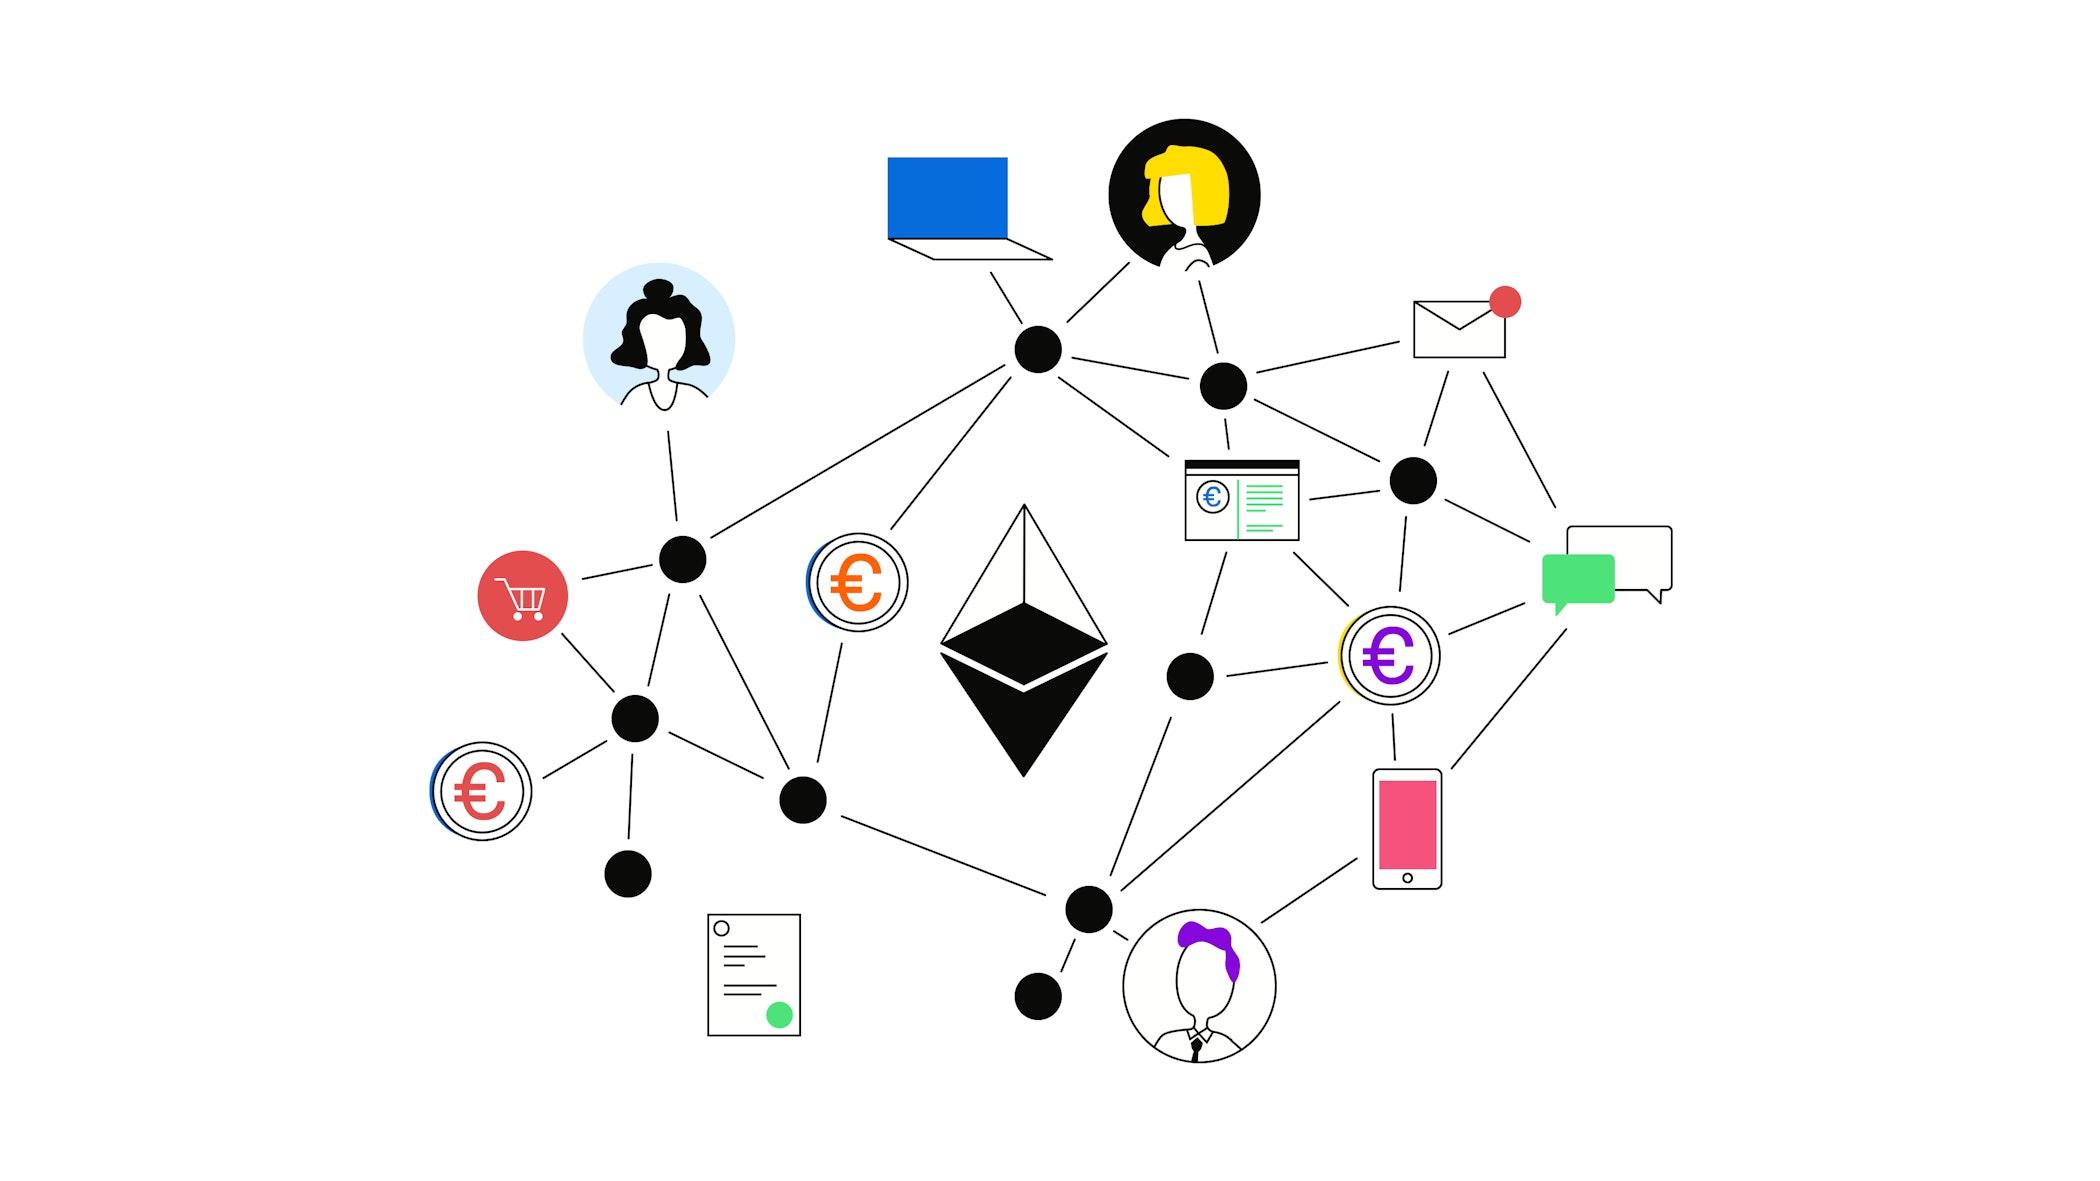 bot handels krypto bitpanda gebühren ethereum